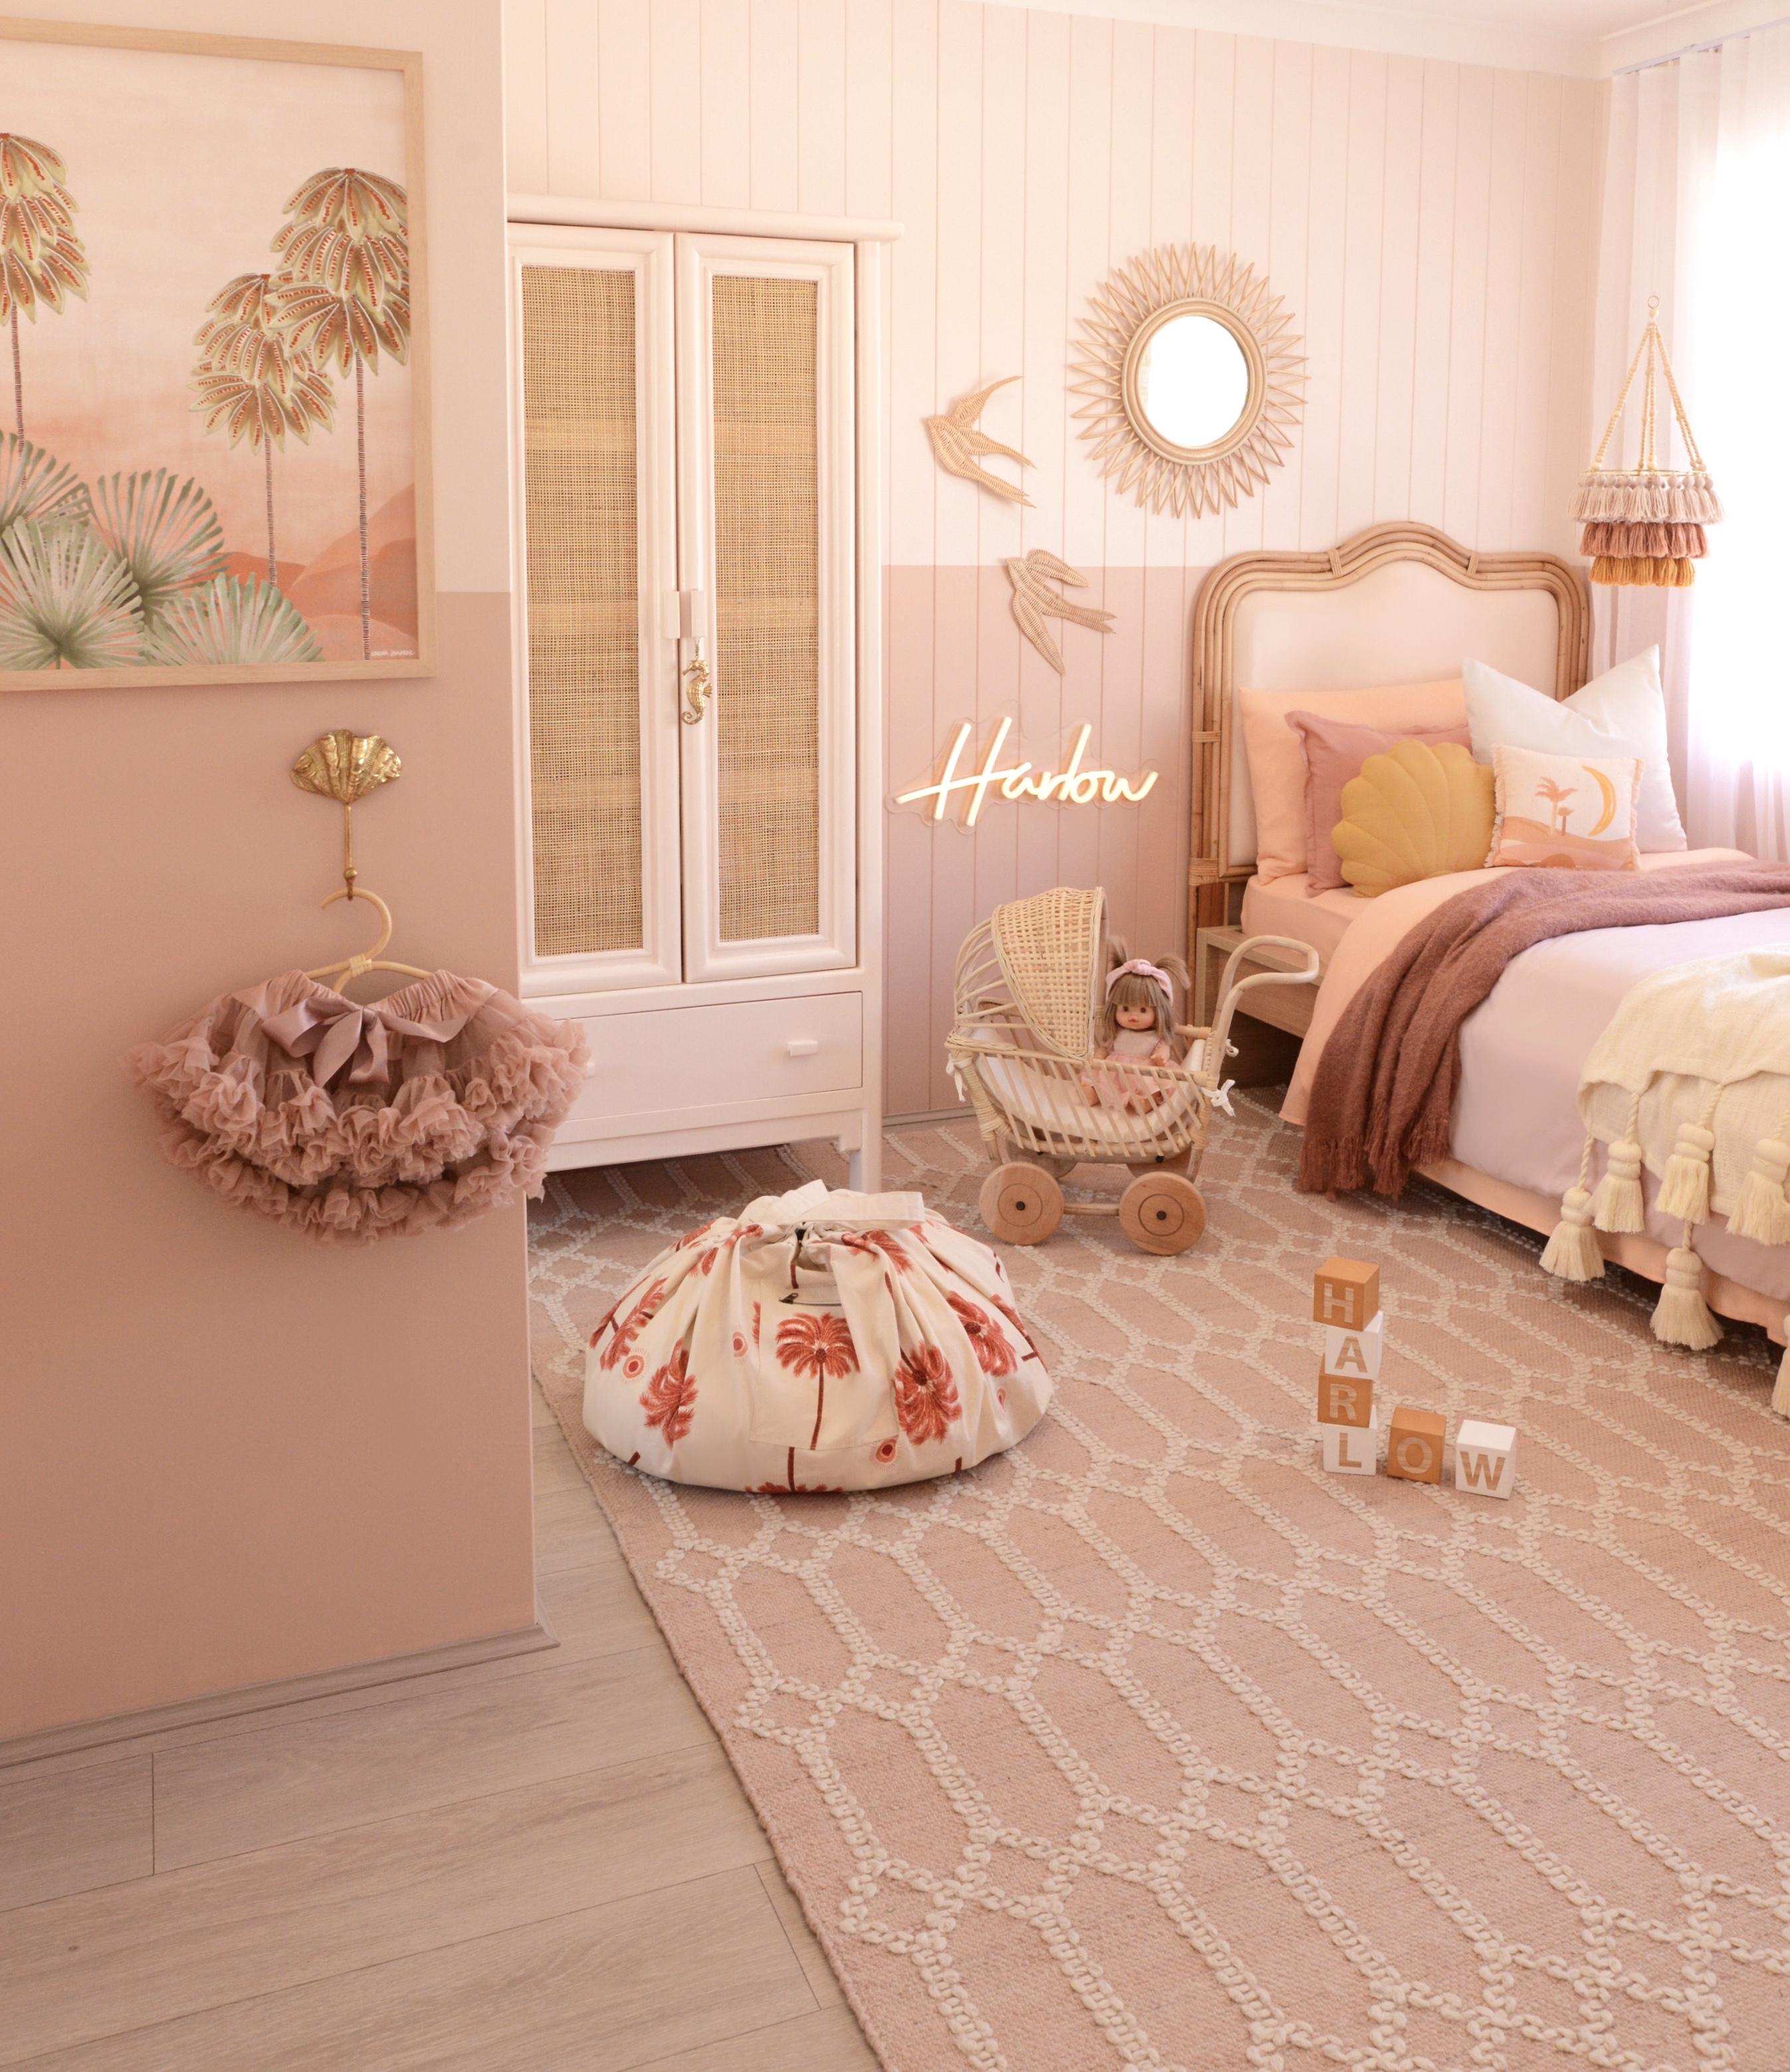 Harlows bedroom 1